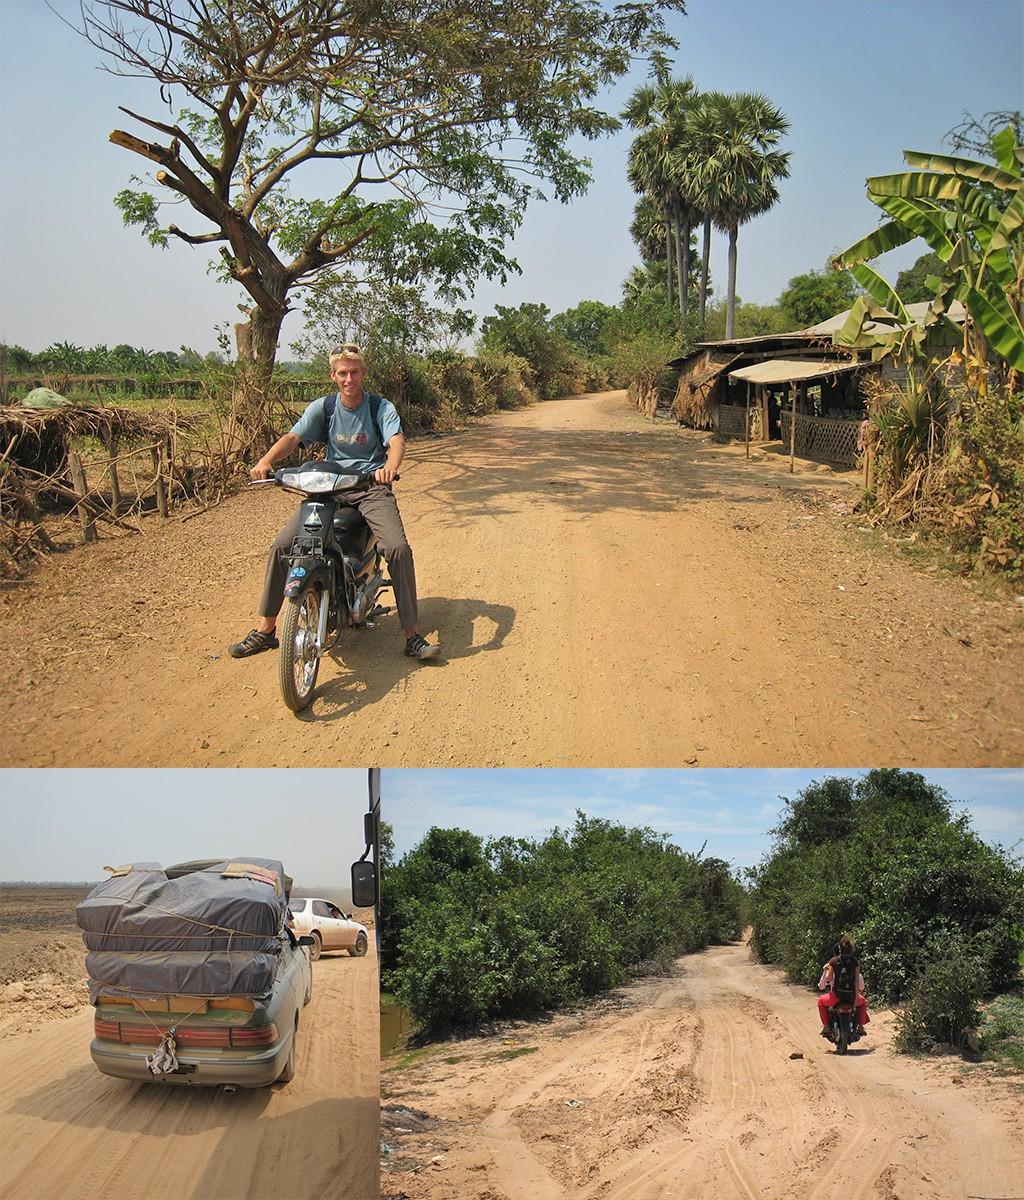 Battambang op de motorbike